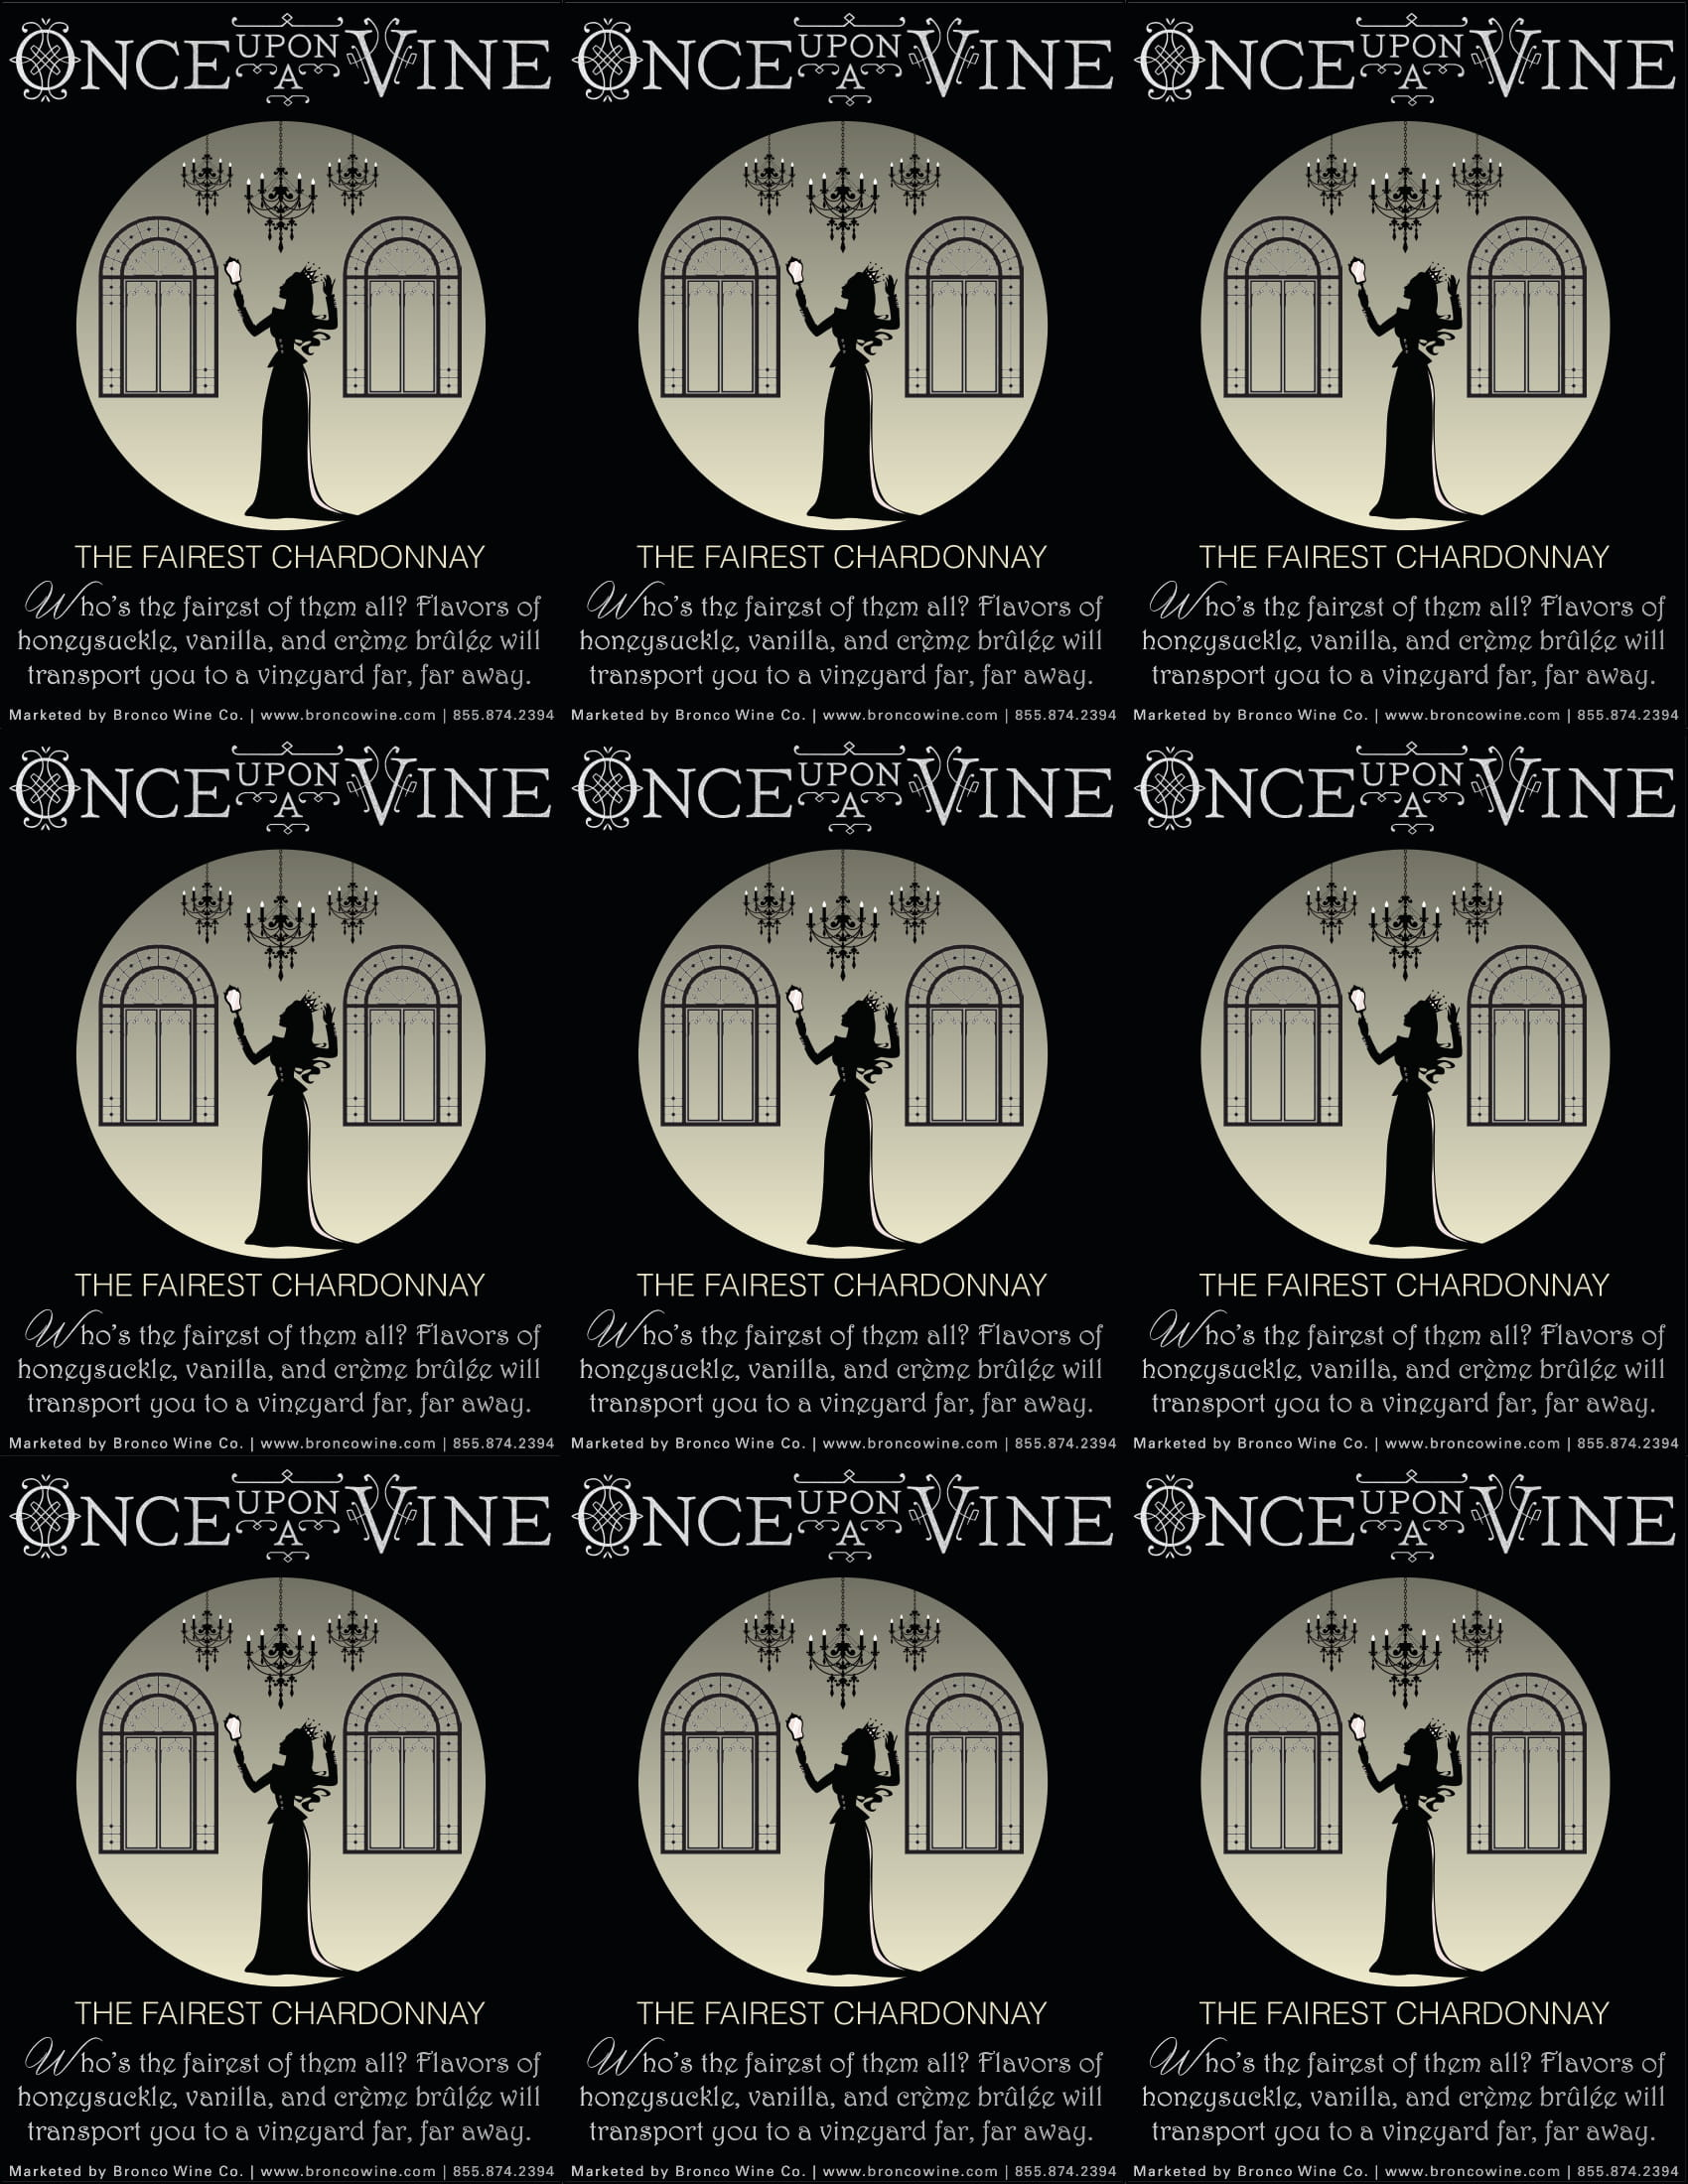 Once Upon A Vine The Fairest Chardonnay Shelf Talker